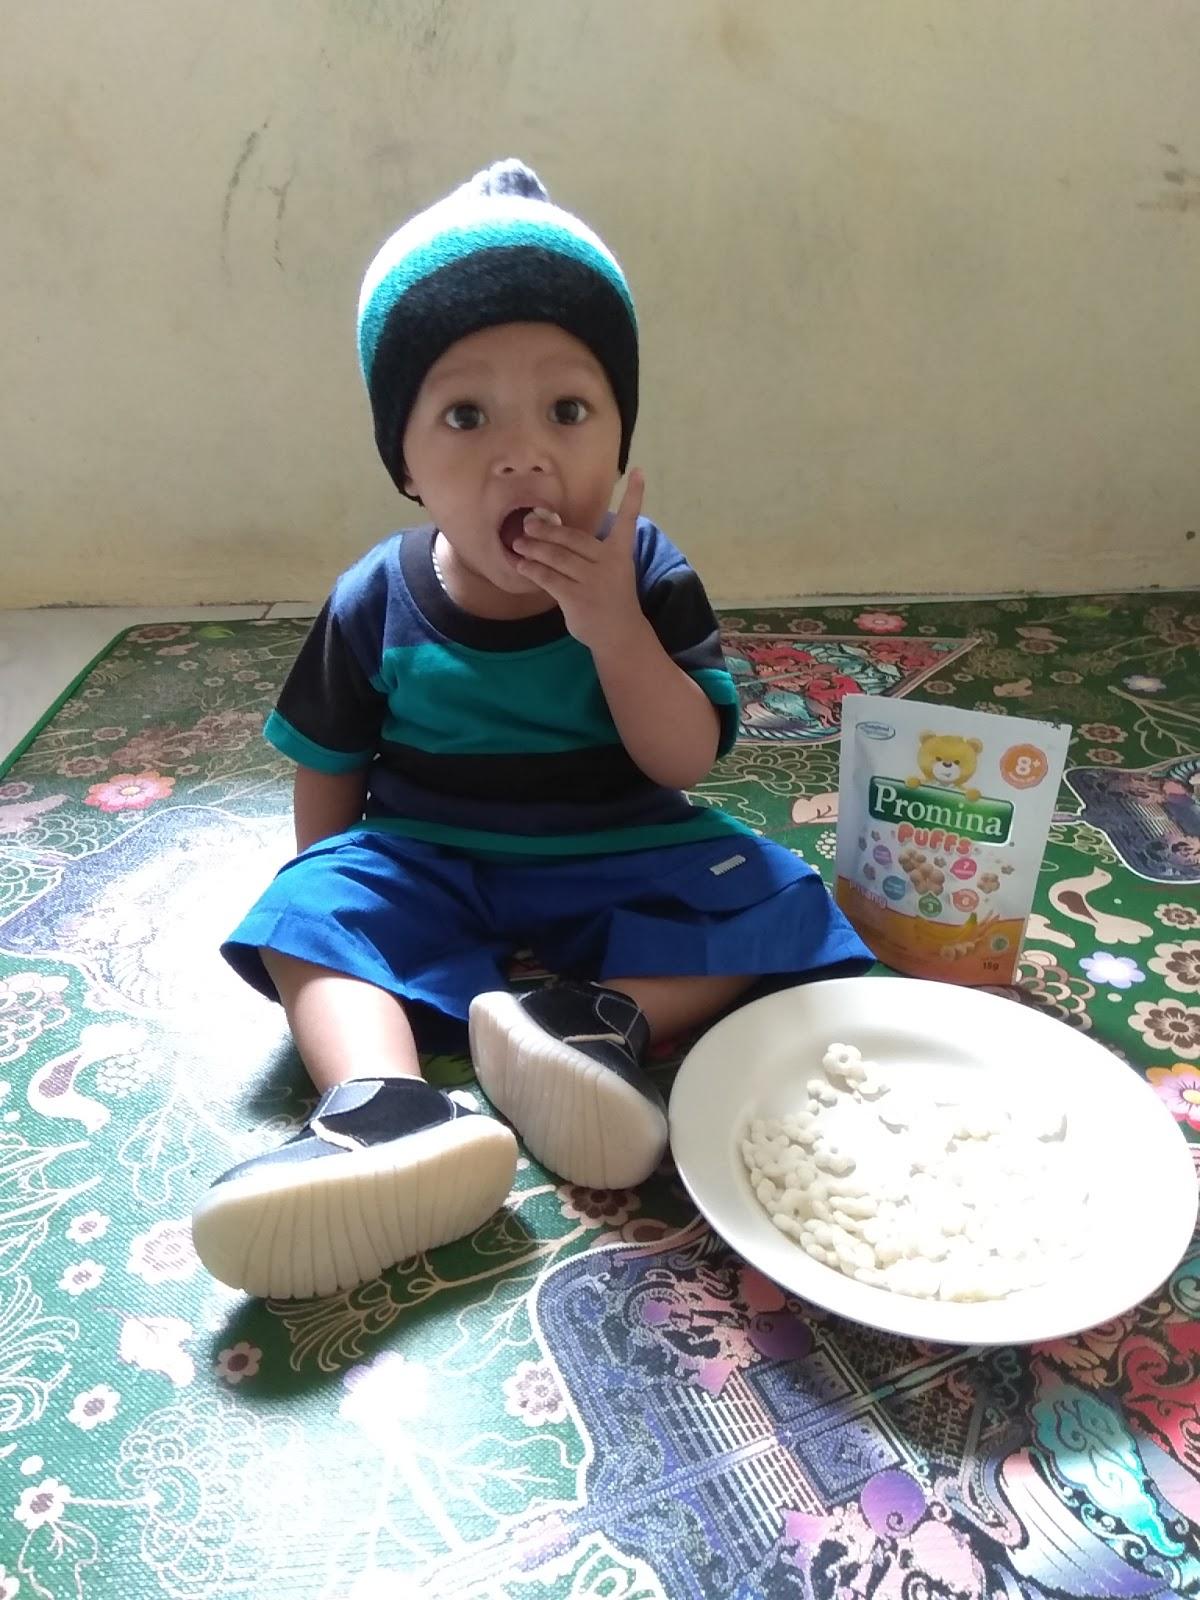 Review Promina Puffs Snack Bayi Tepat Untuk Si Kecil Sweet Home Puff Pisang Sultan With His Banana Finger